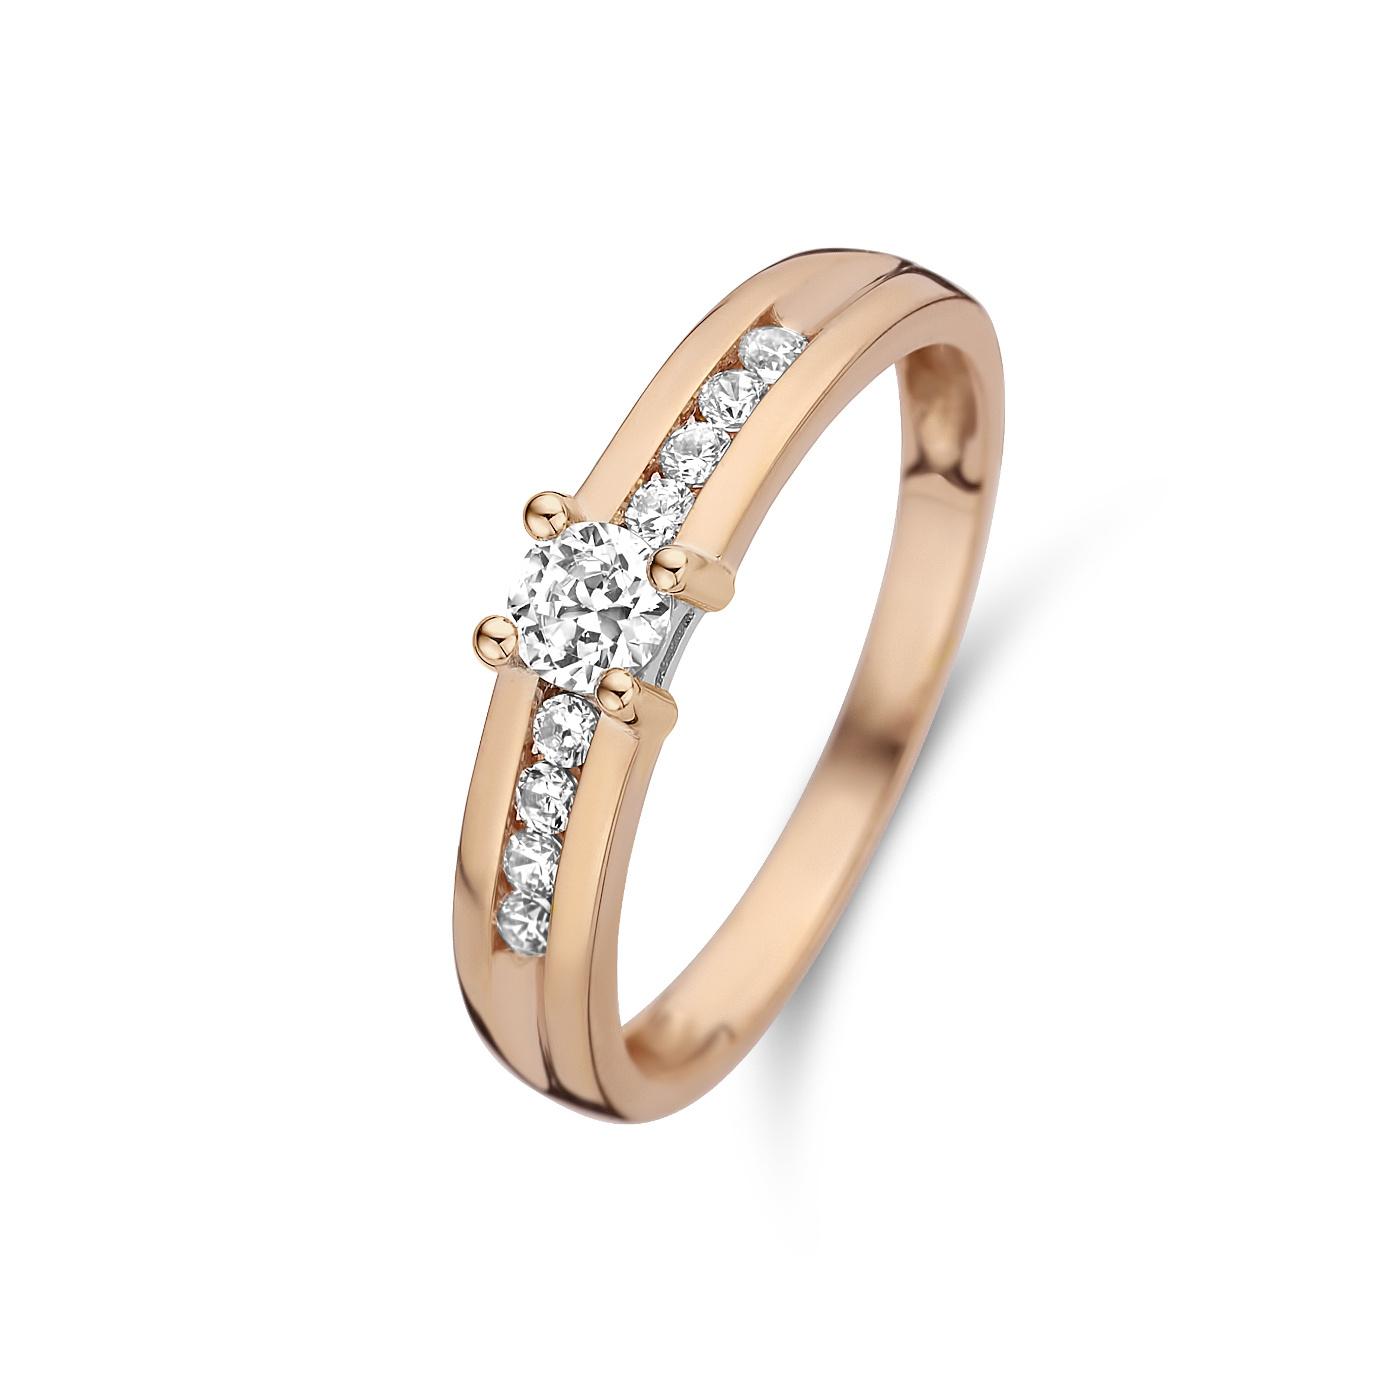 Isabel Bernard La Concorde Lou-Anne 14 karat rose gold ring zirconia